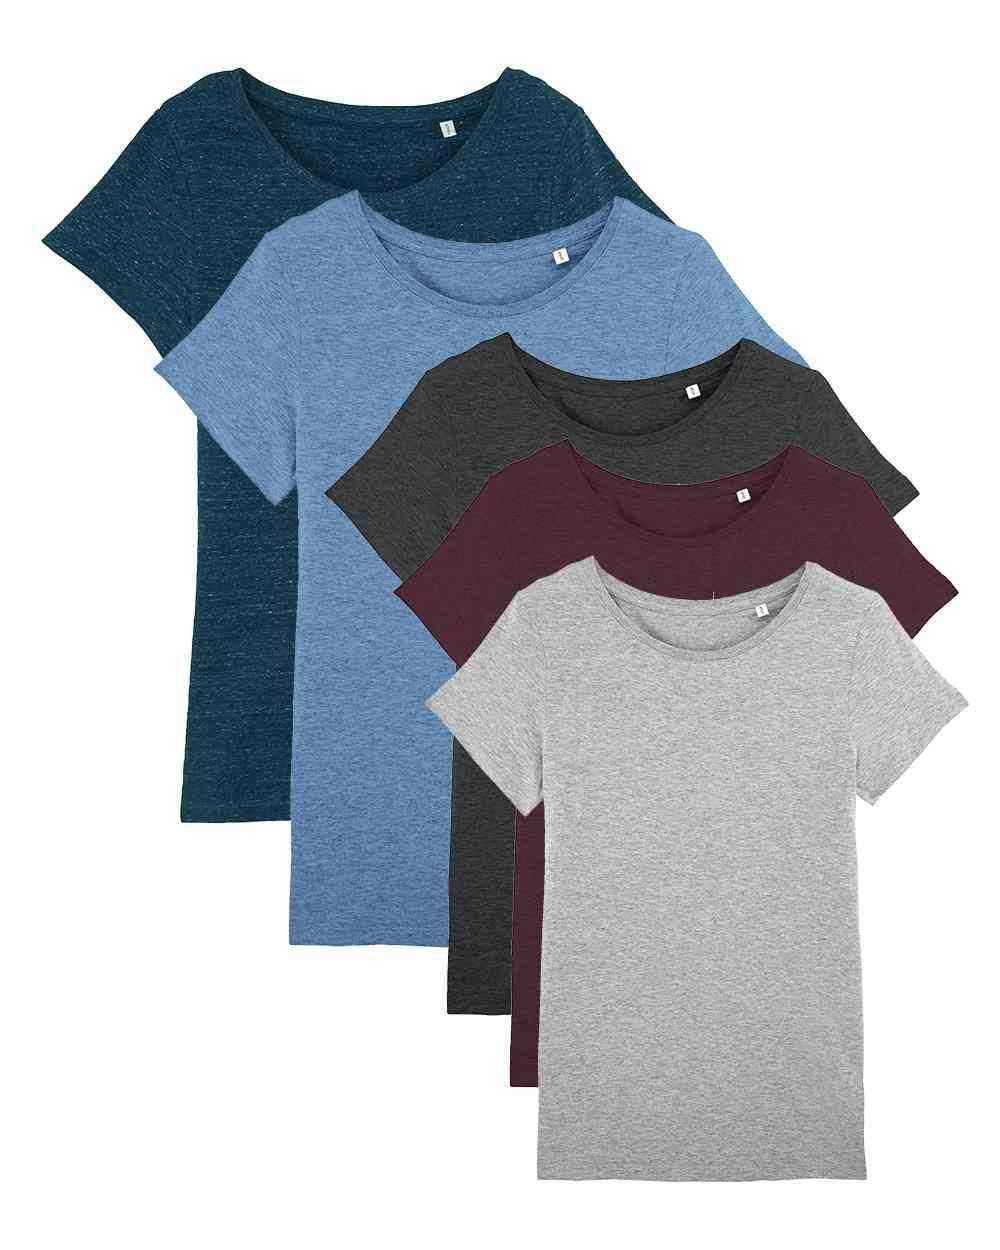 9833a7e87ec532 Basic Damen T-Shirt aus 100% Bio-Baumwolle billiger im Mehrfach-Pack ...